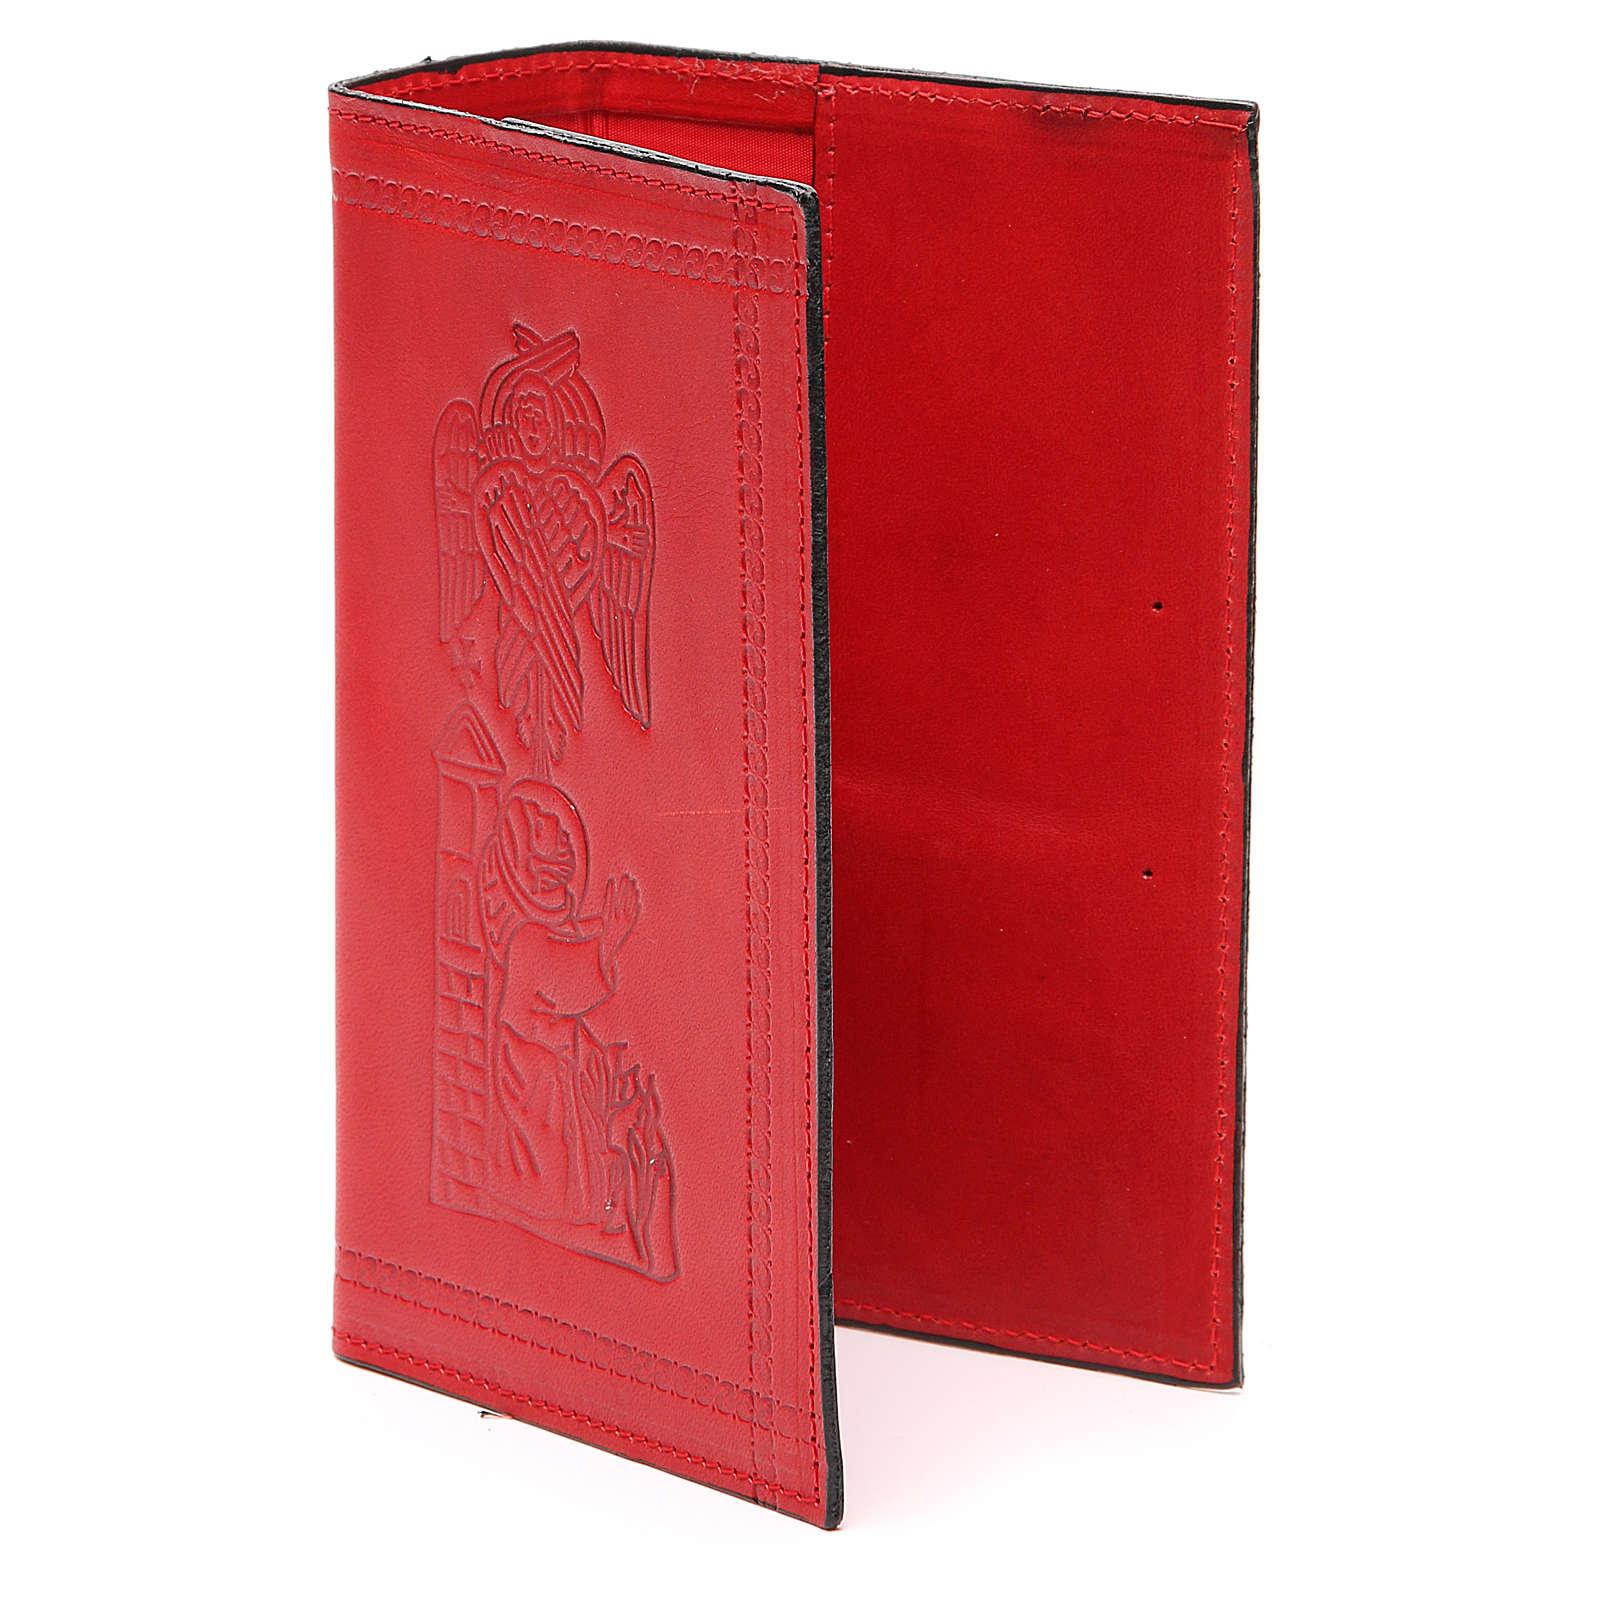 Copertina Lit. vol. unico pelle rossa S. Francesco impresso 4